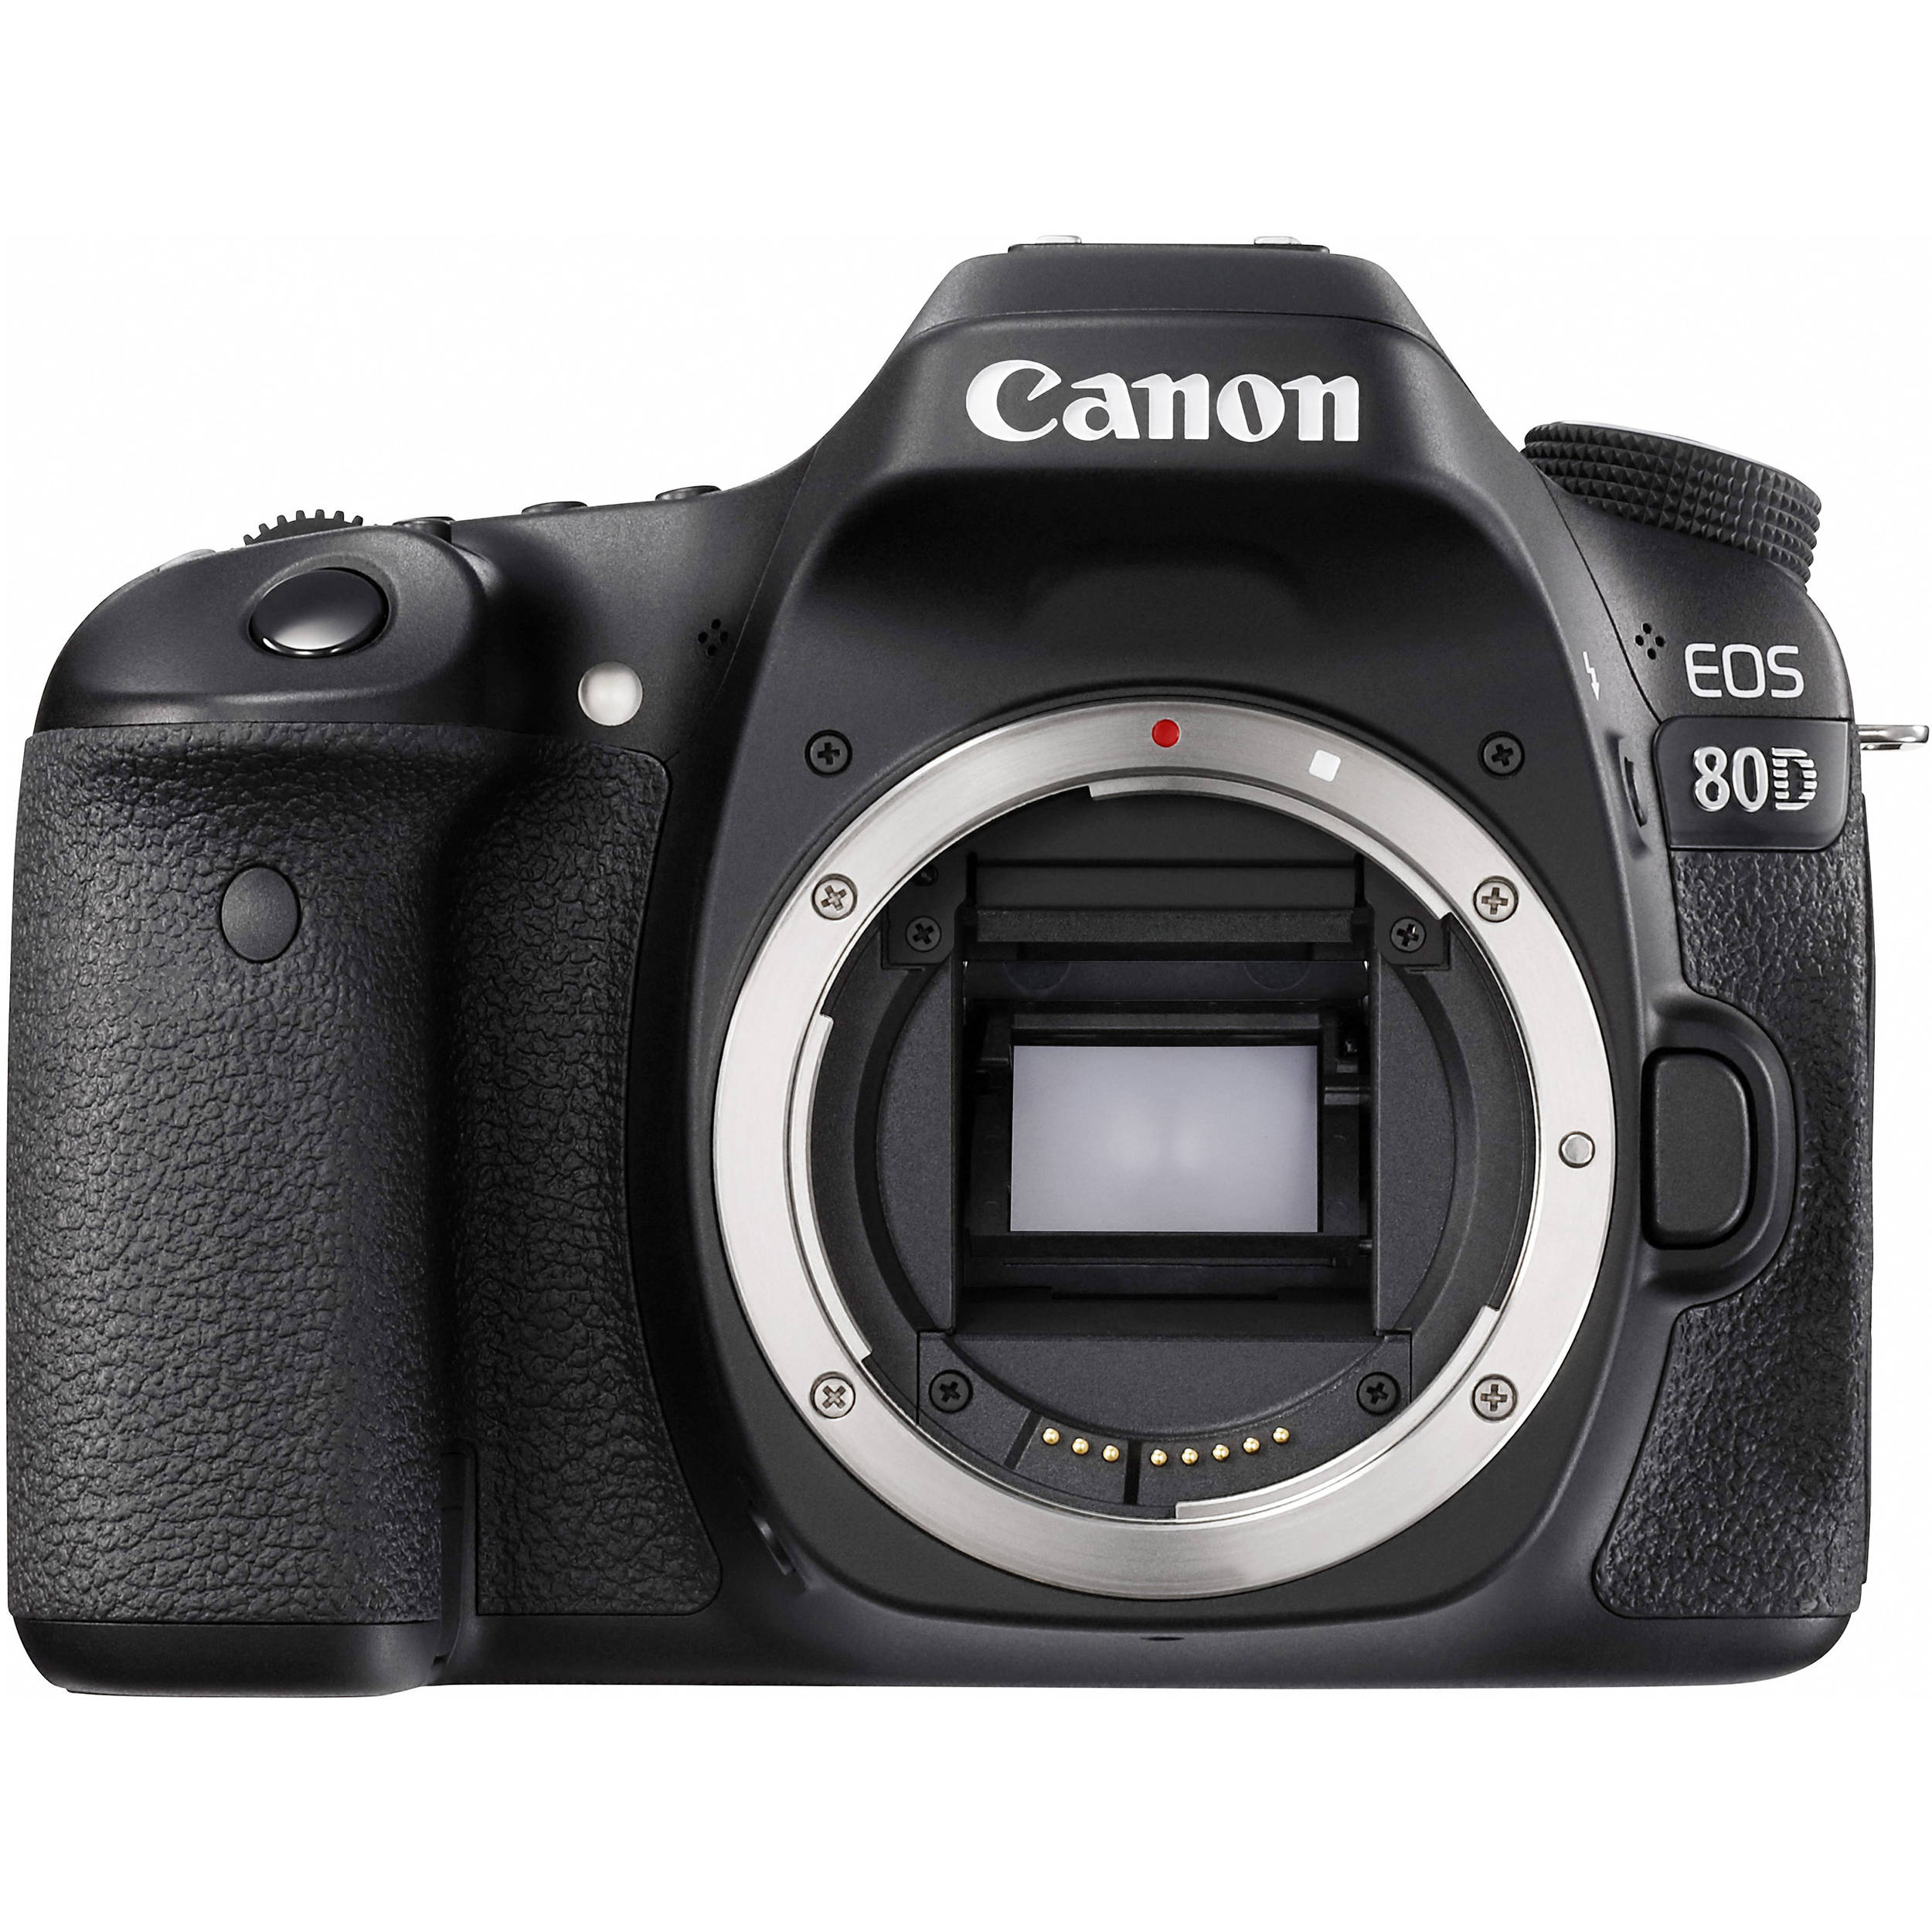 canon_1263c004_eos_80d_dslr_camera_1225875.jpg